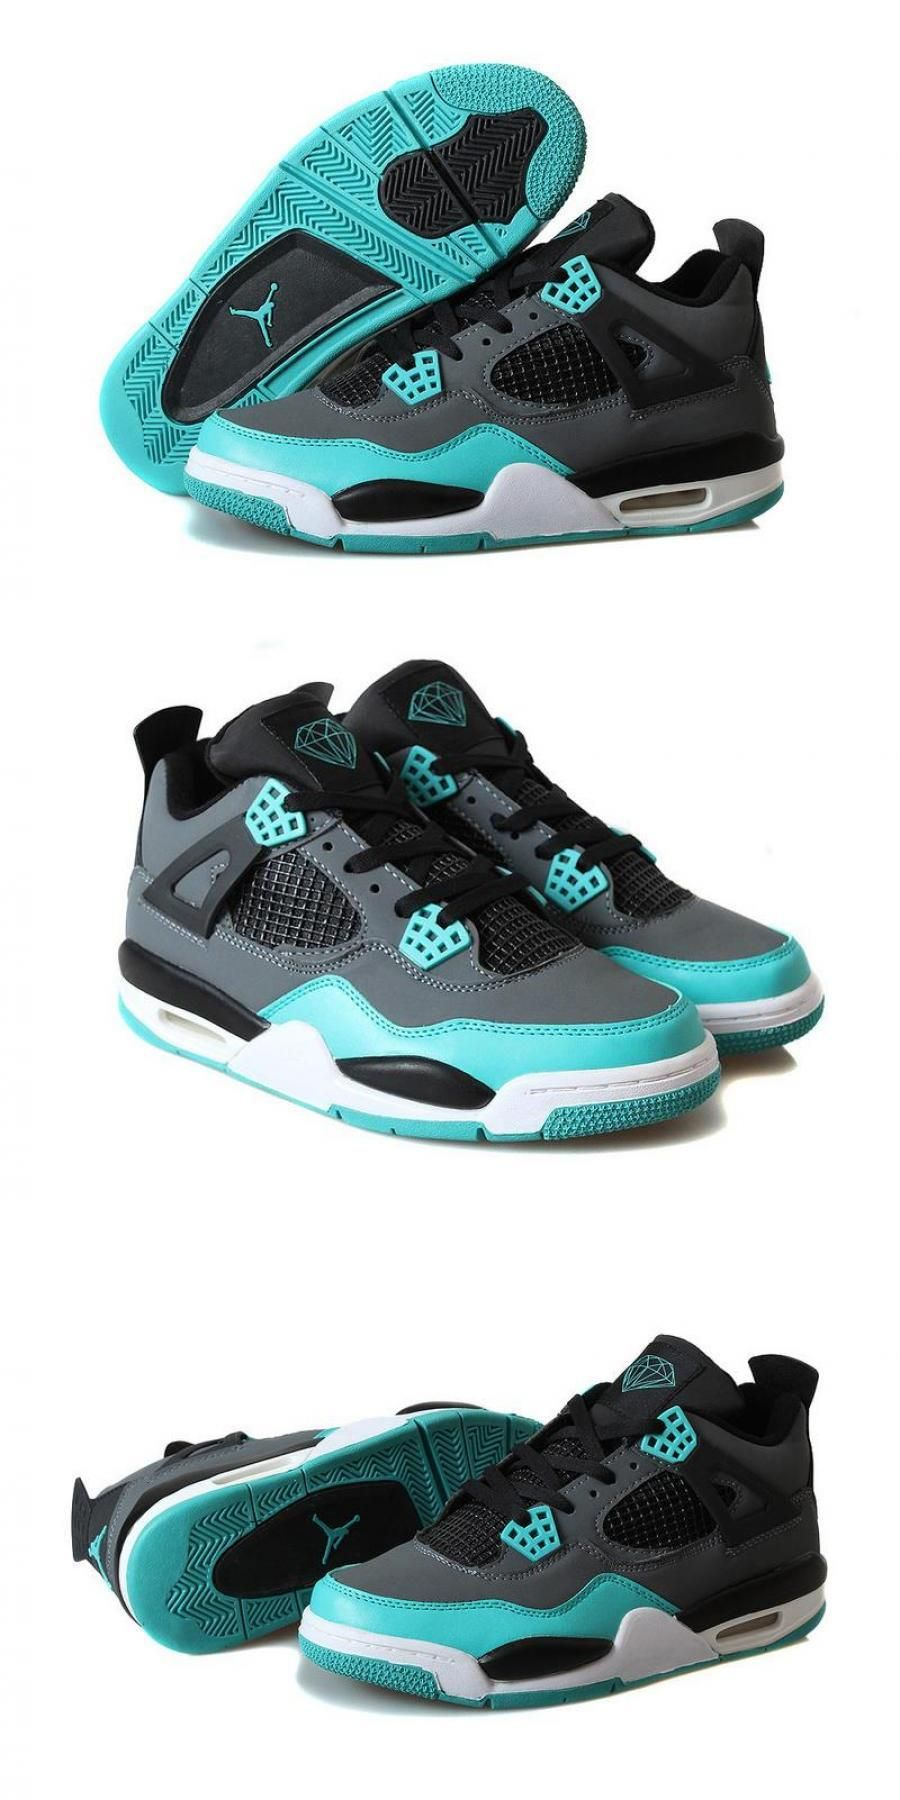 "Air Jordan 4 Retro ""tiffany"" Tealblack/cement Grey in"